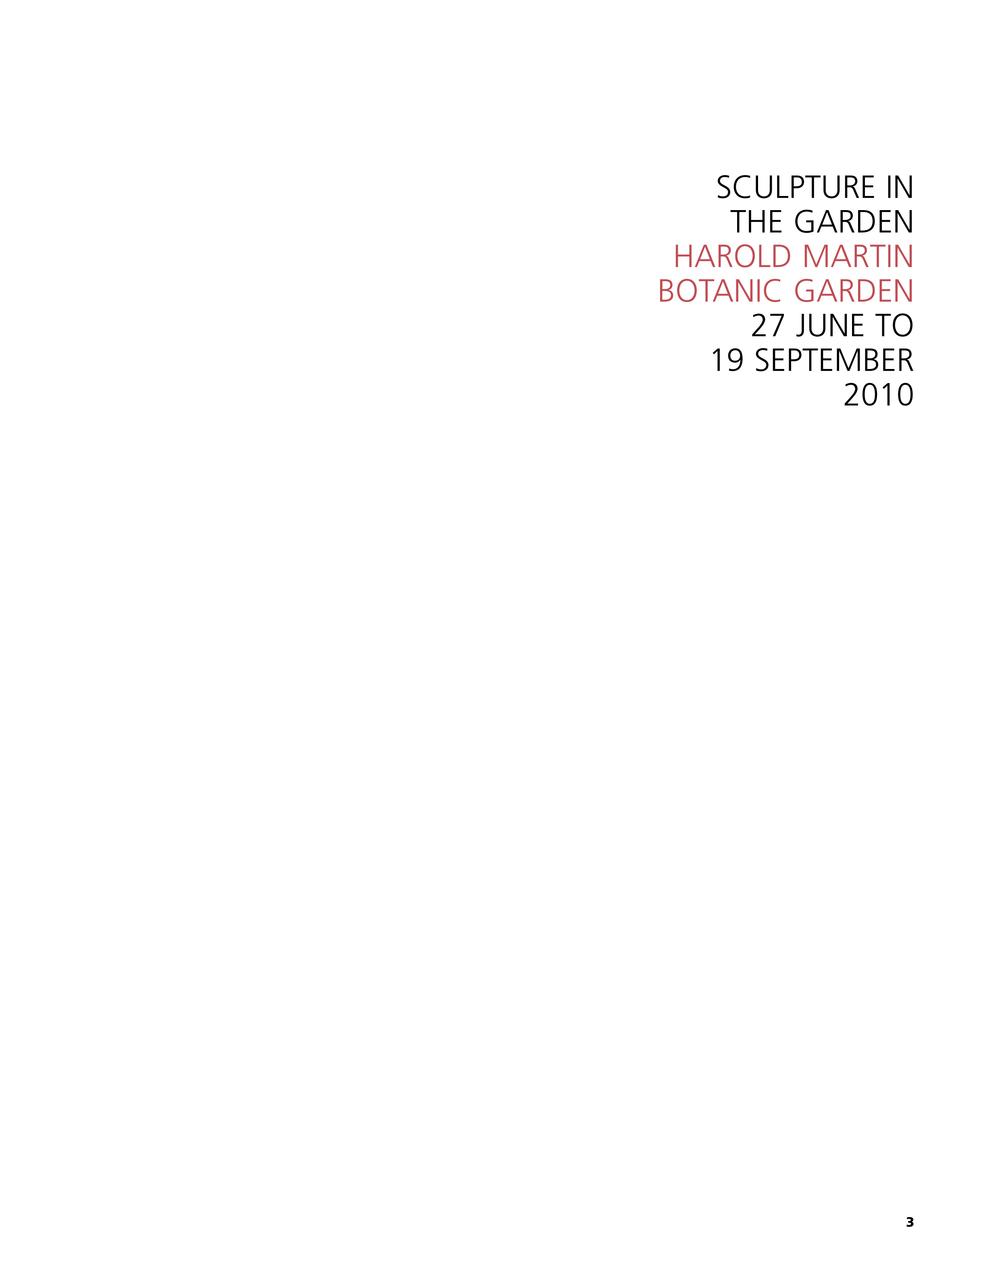 sculpturebooklet 2010 Leicester-3.jpg